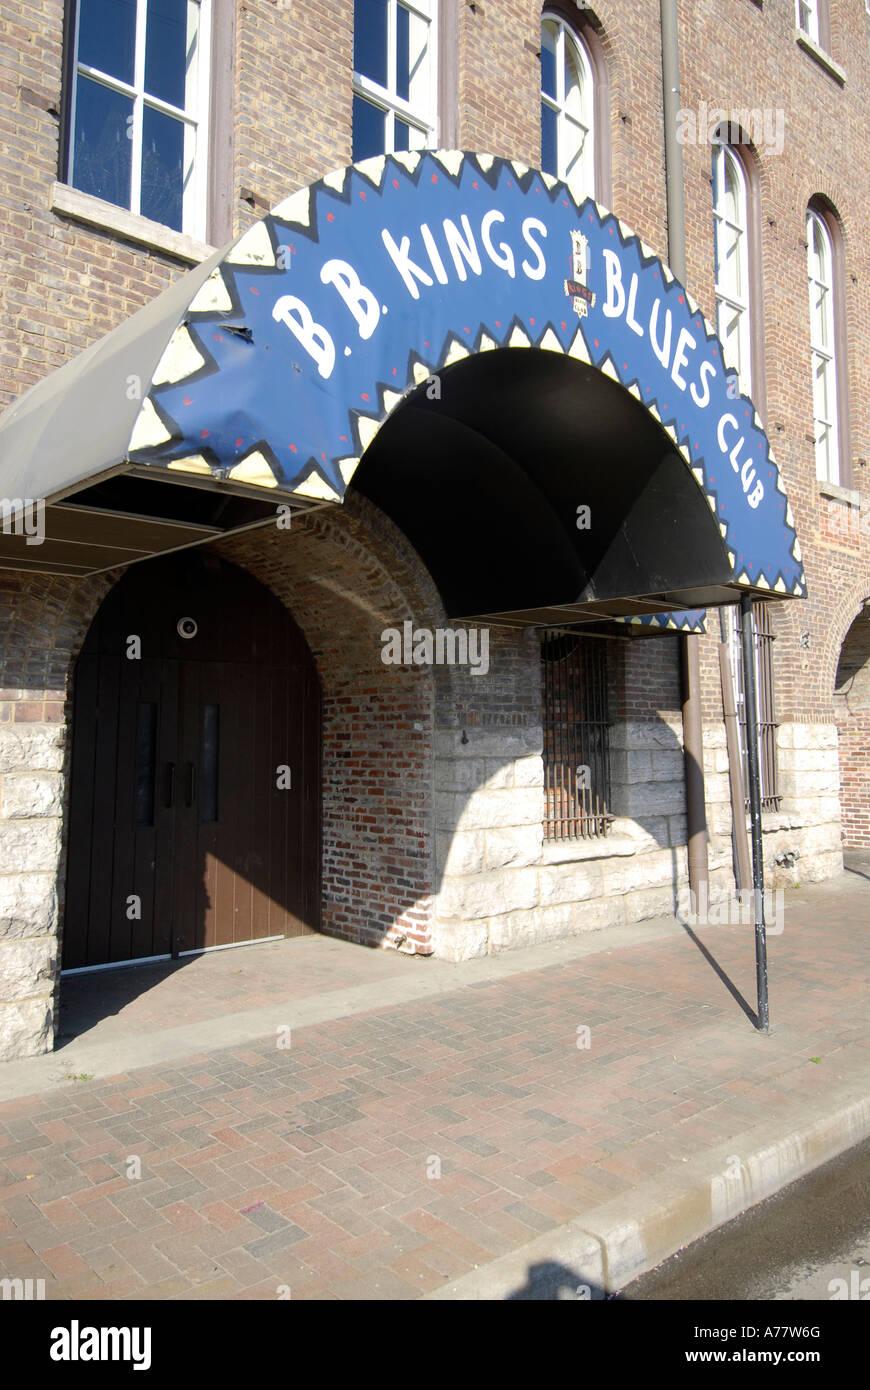 B B Kings Blues Club Nashville Tennessee TN Tenn US USA United States of America American Music City Stock Photo